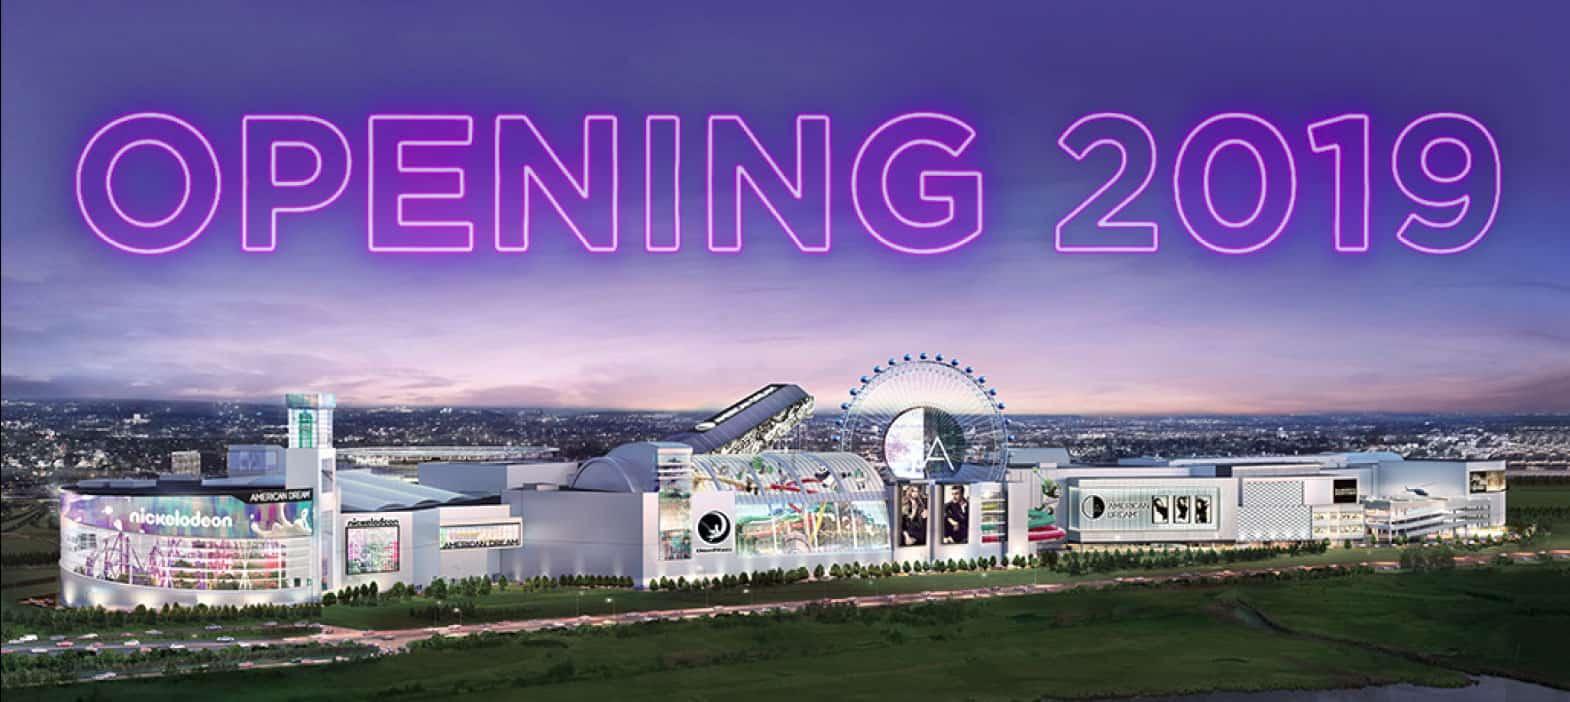 american dream opening 2019